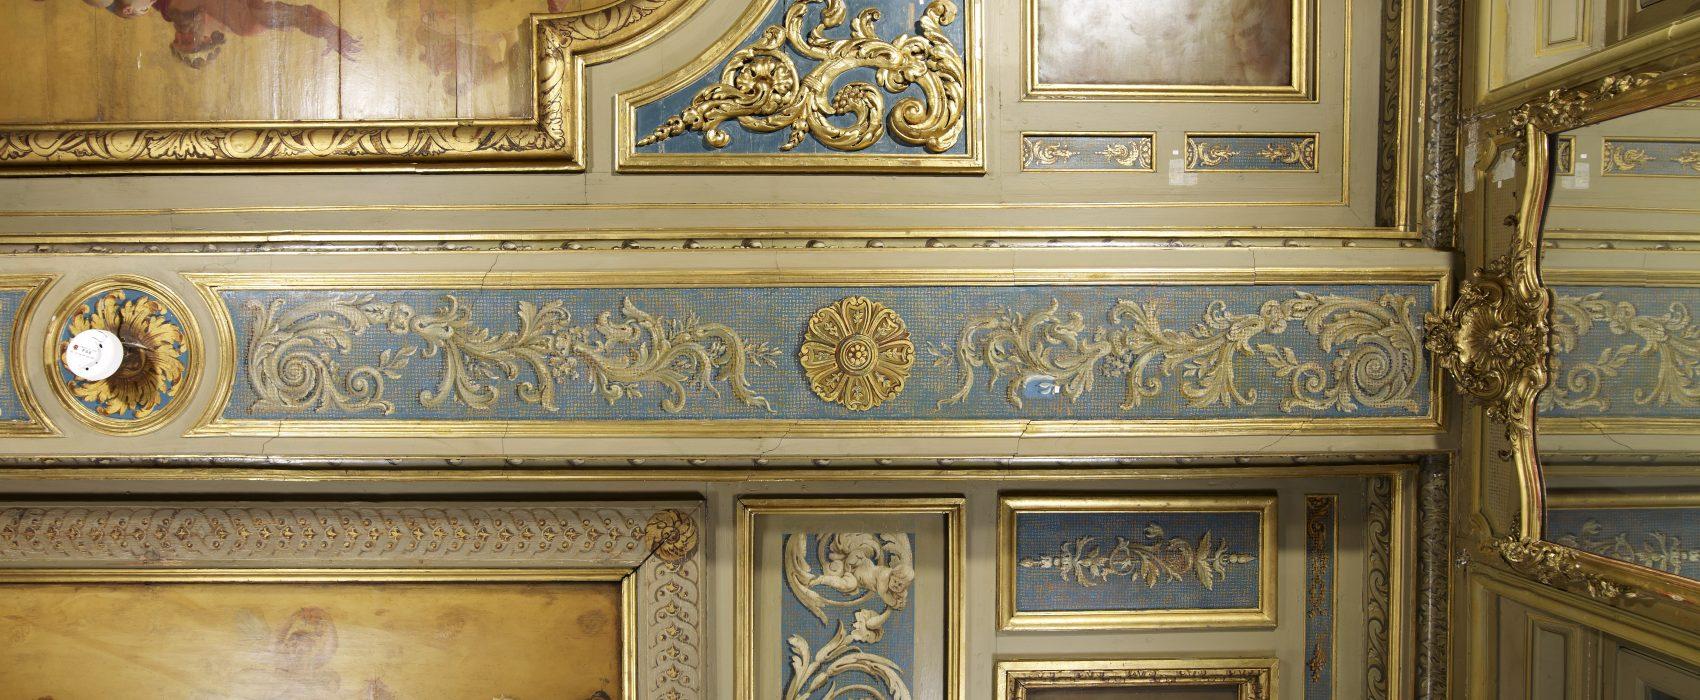 Lambert_grand cabinet C1009_2-squashed